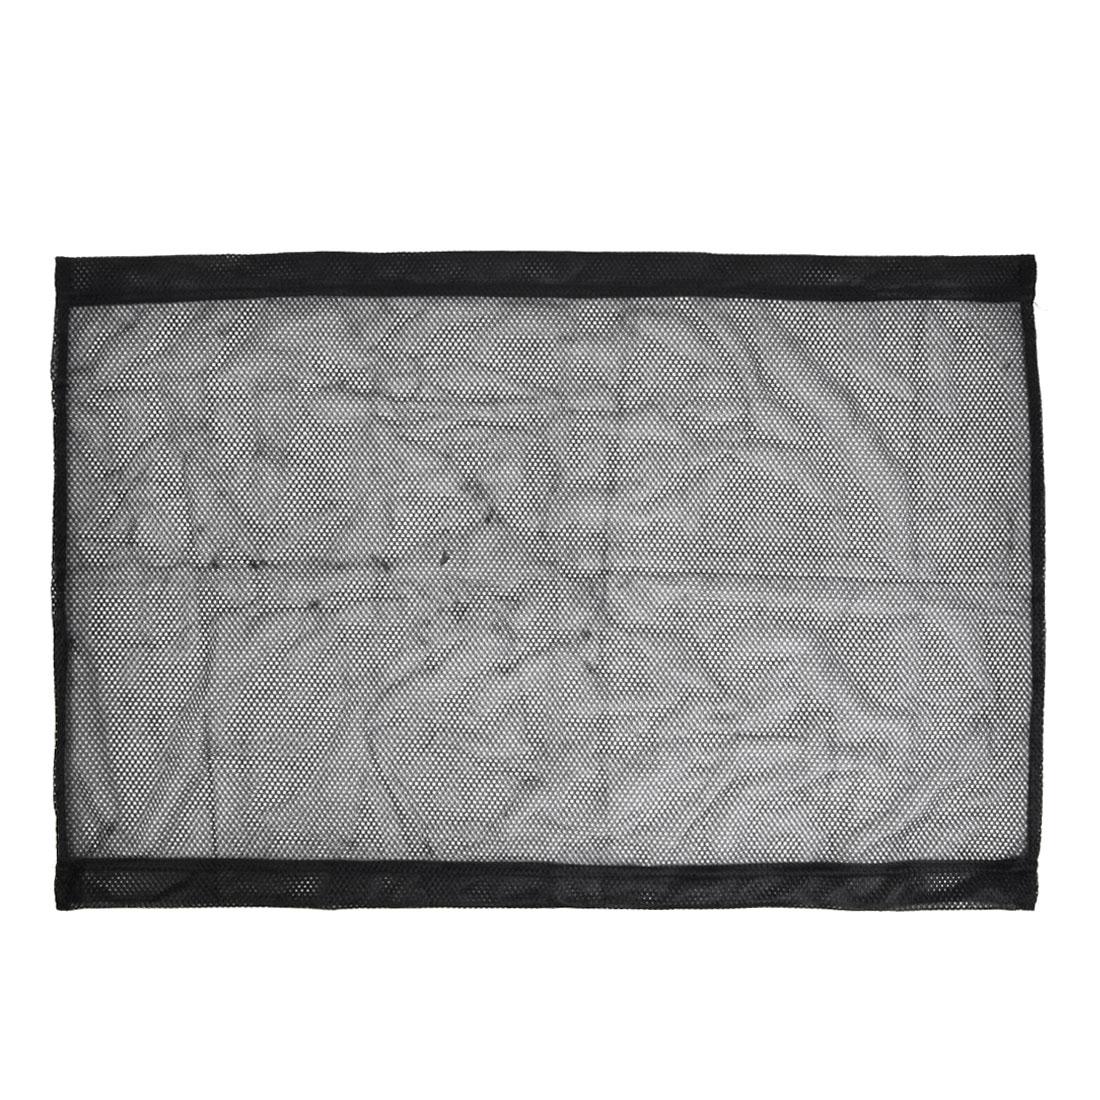 Black Retractable Meshy Rear Side Window Sun Shade 78 x 52cm